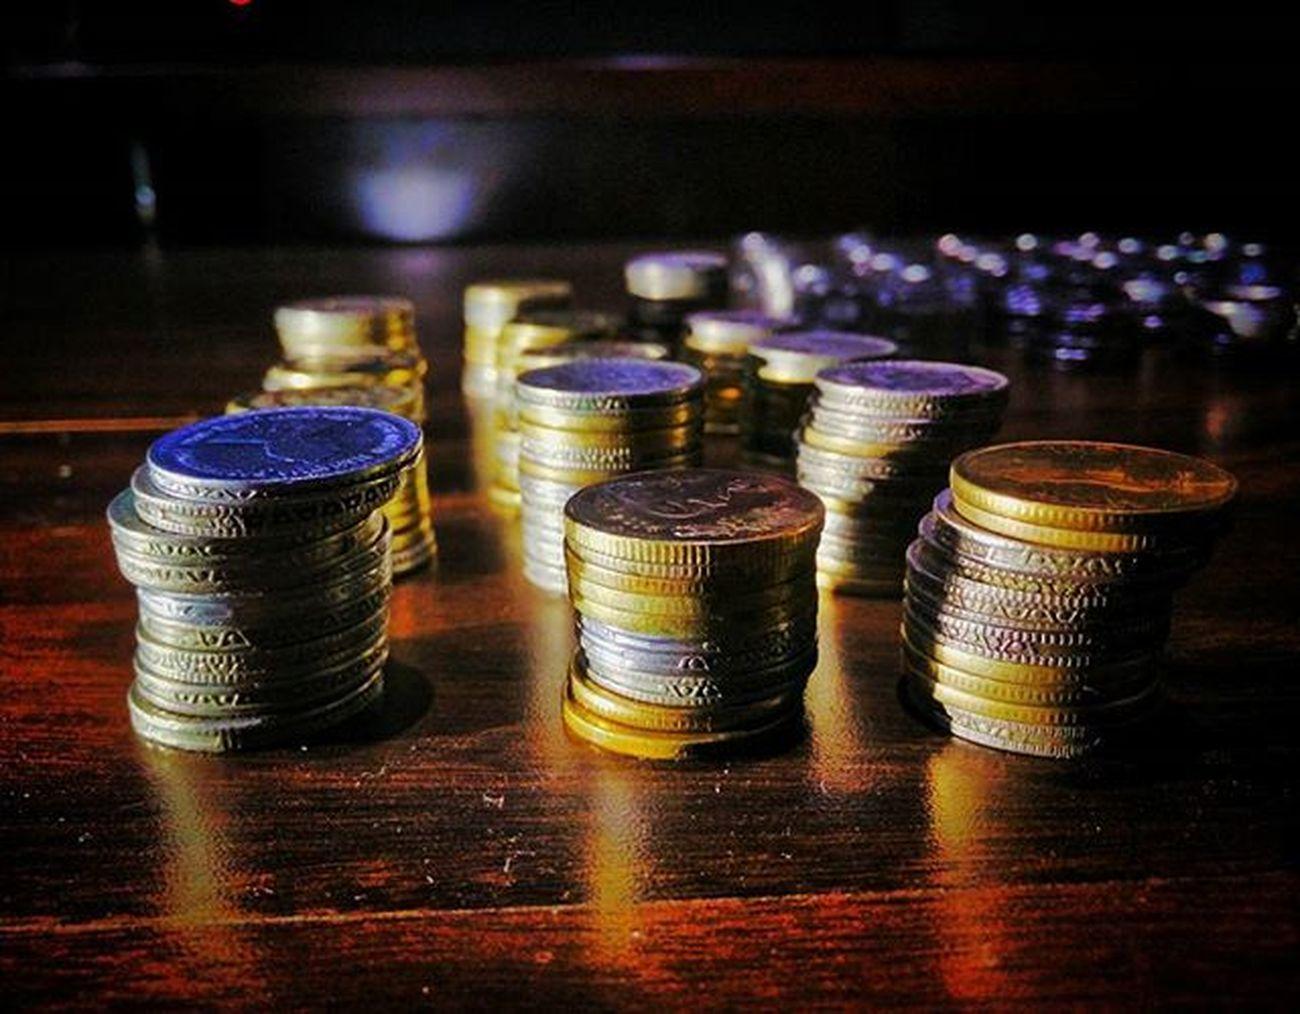 Weekend Buddies Piggybank Coins Counting Oneplusone Onepluslife OneplusShot Igers Nammabengaluru Streetsofindia _soi Igers_world Igers Instapic Instabengaluru Nkmemes Igers_world Insta_world